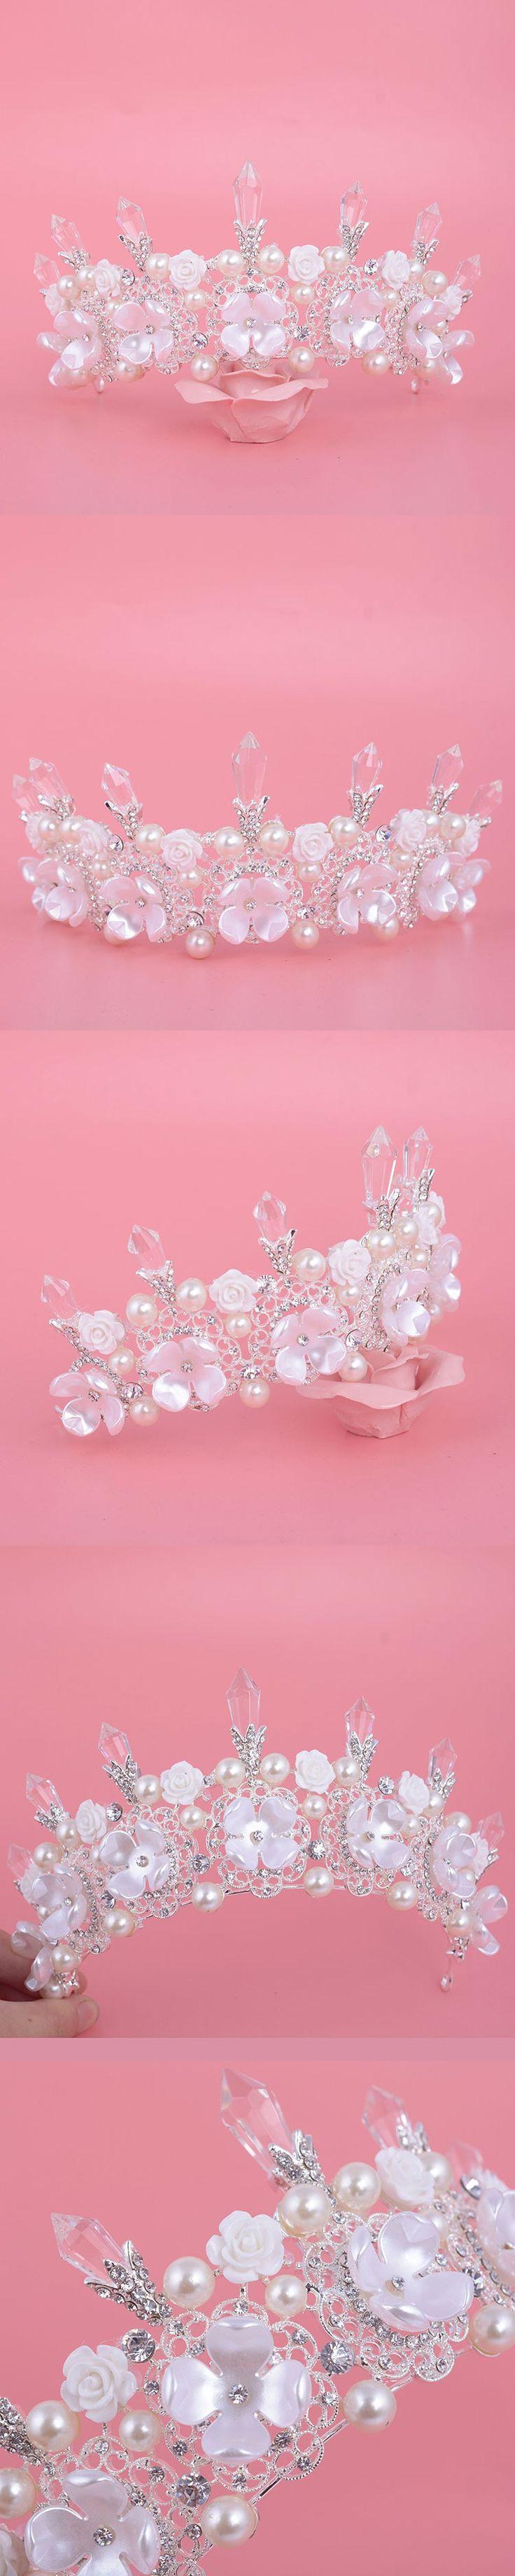 New Charm Women Crown Handmade Bridal Tiara Crystal pearl flower Design wedding Hair Accessories For brides Dress Hair jewelry $15.6